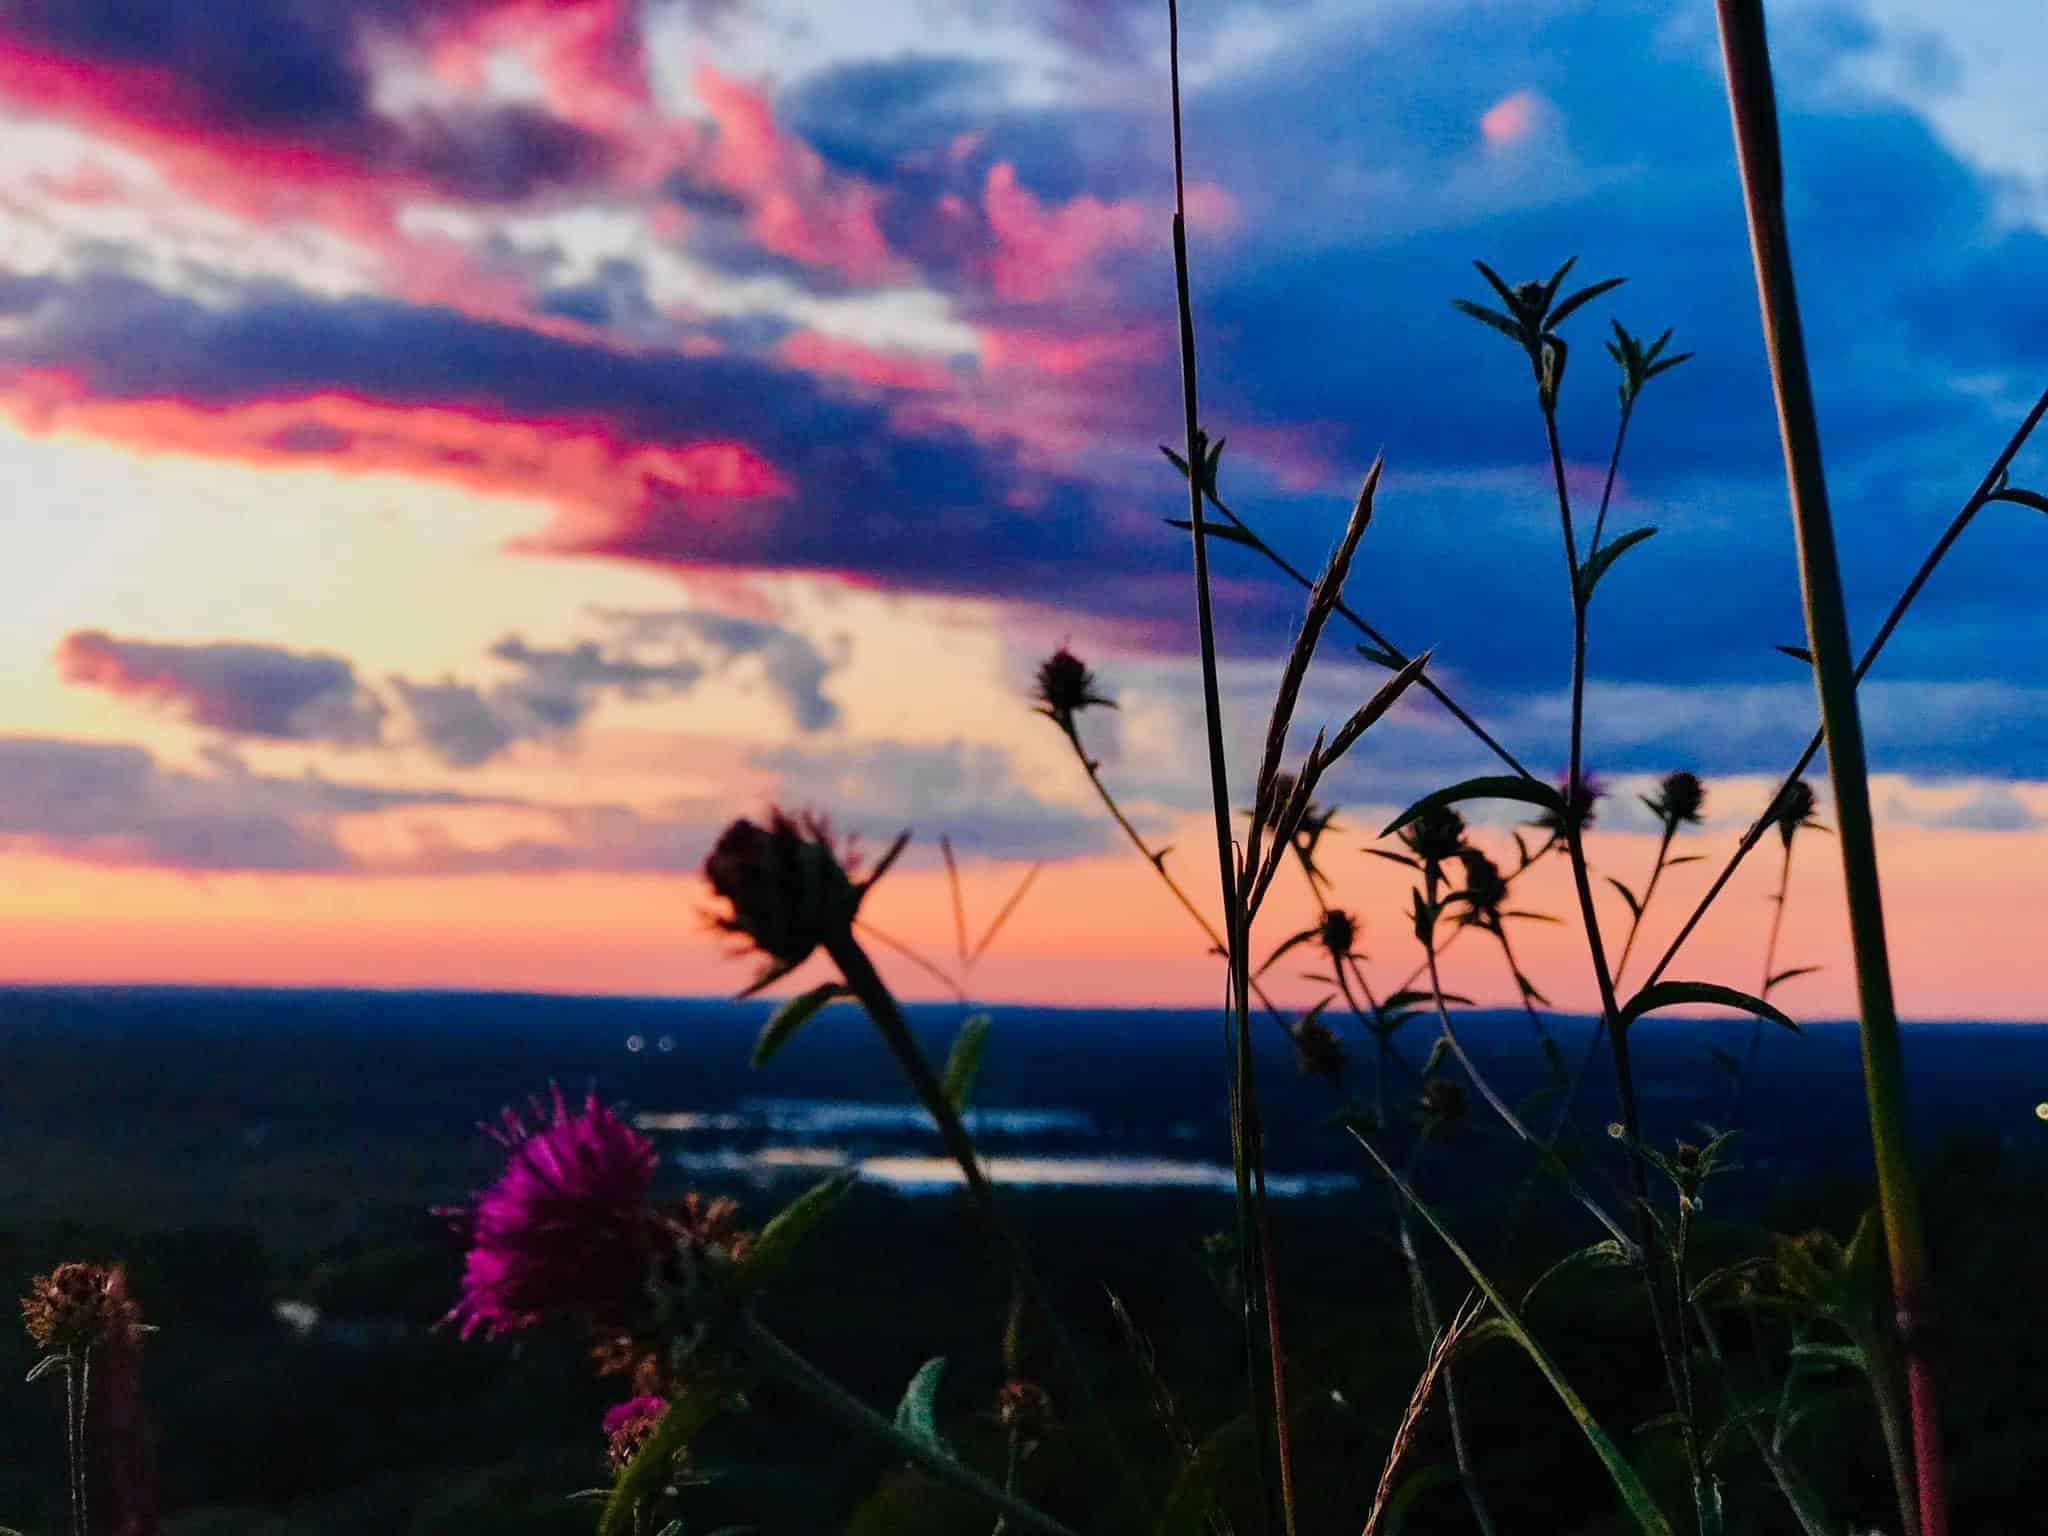 sunset at trailside museum blue hills